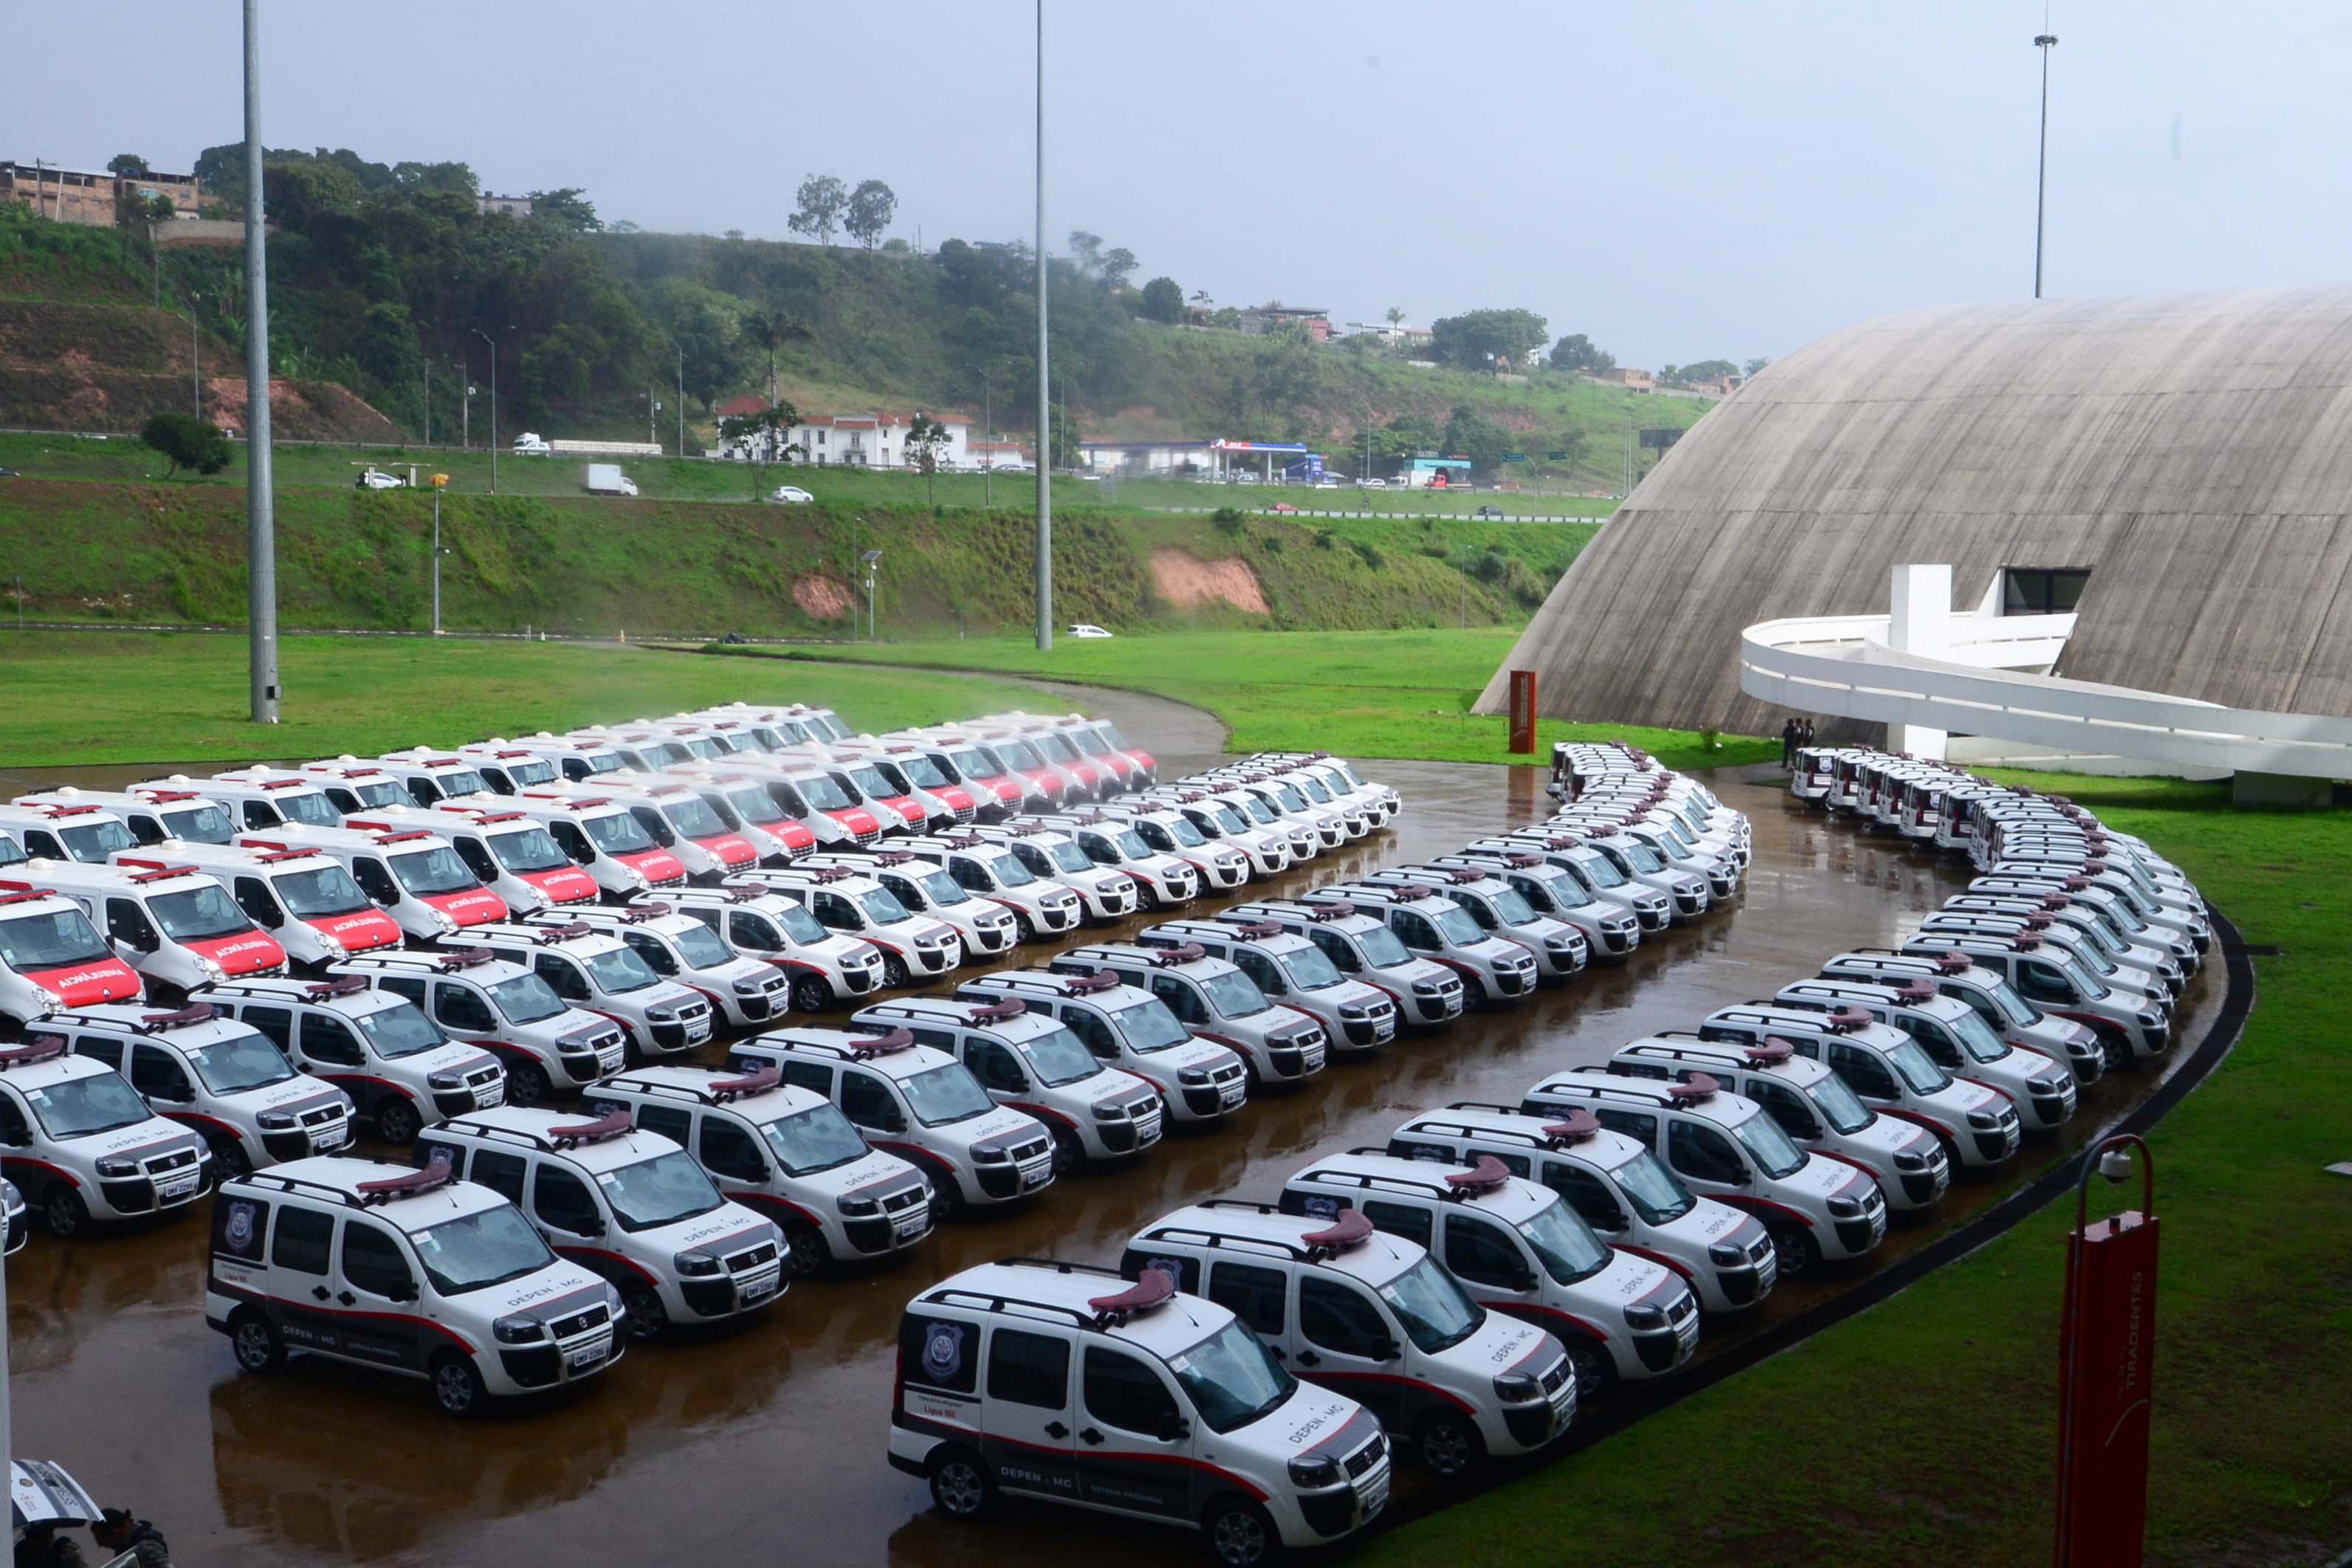 Governado de Minas entrega 107 veículos ao sistema prisional do estado